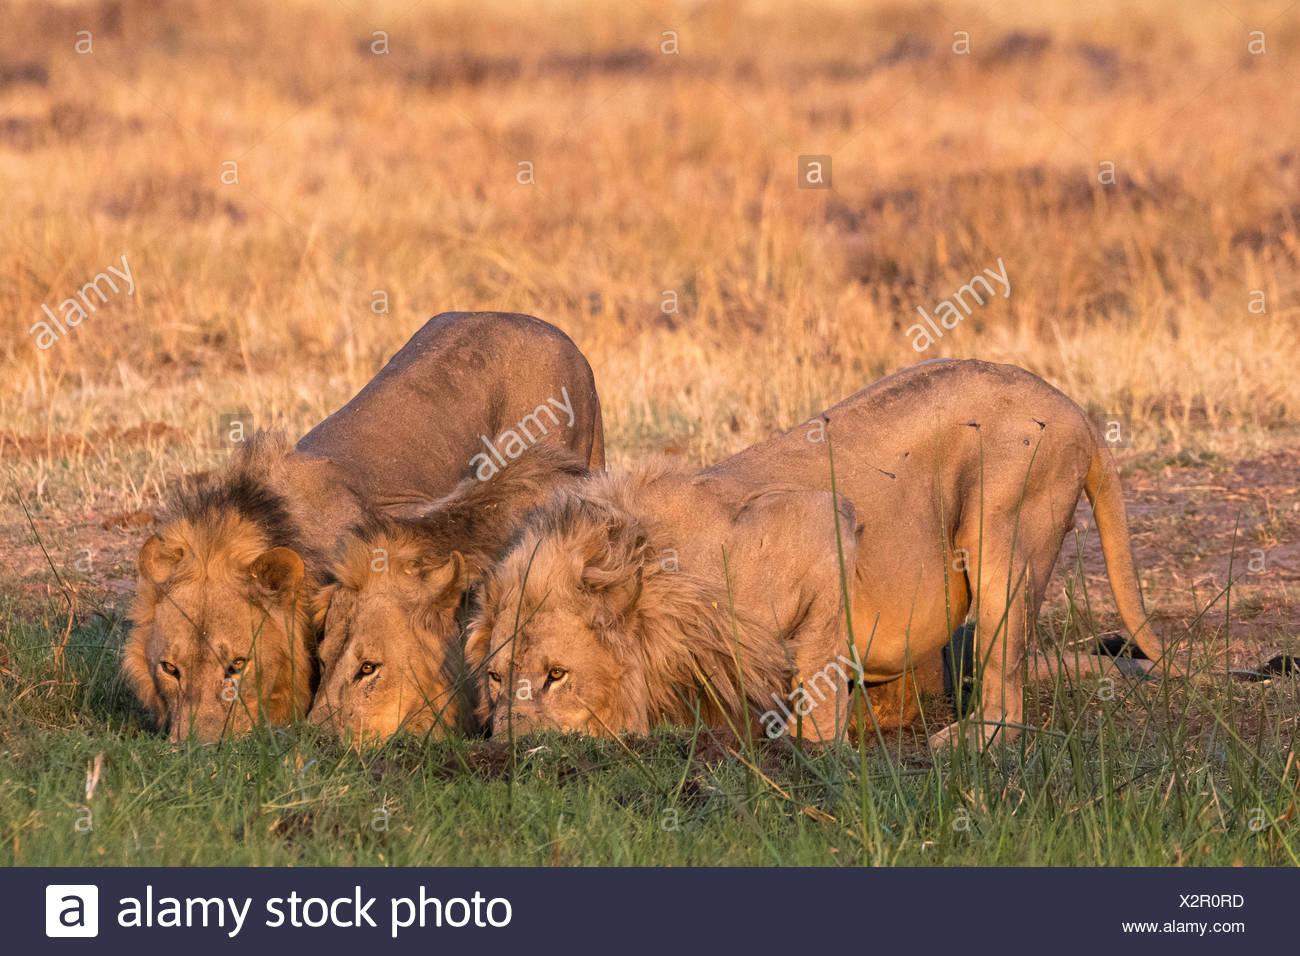 Three lions, Panthera leo, drinking at sunset. - Stock Image